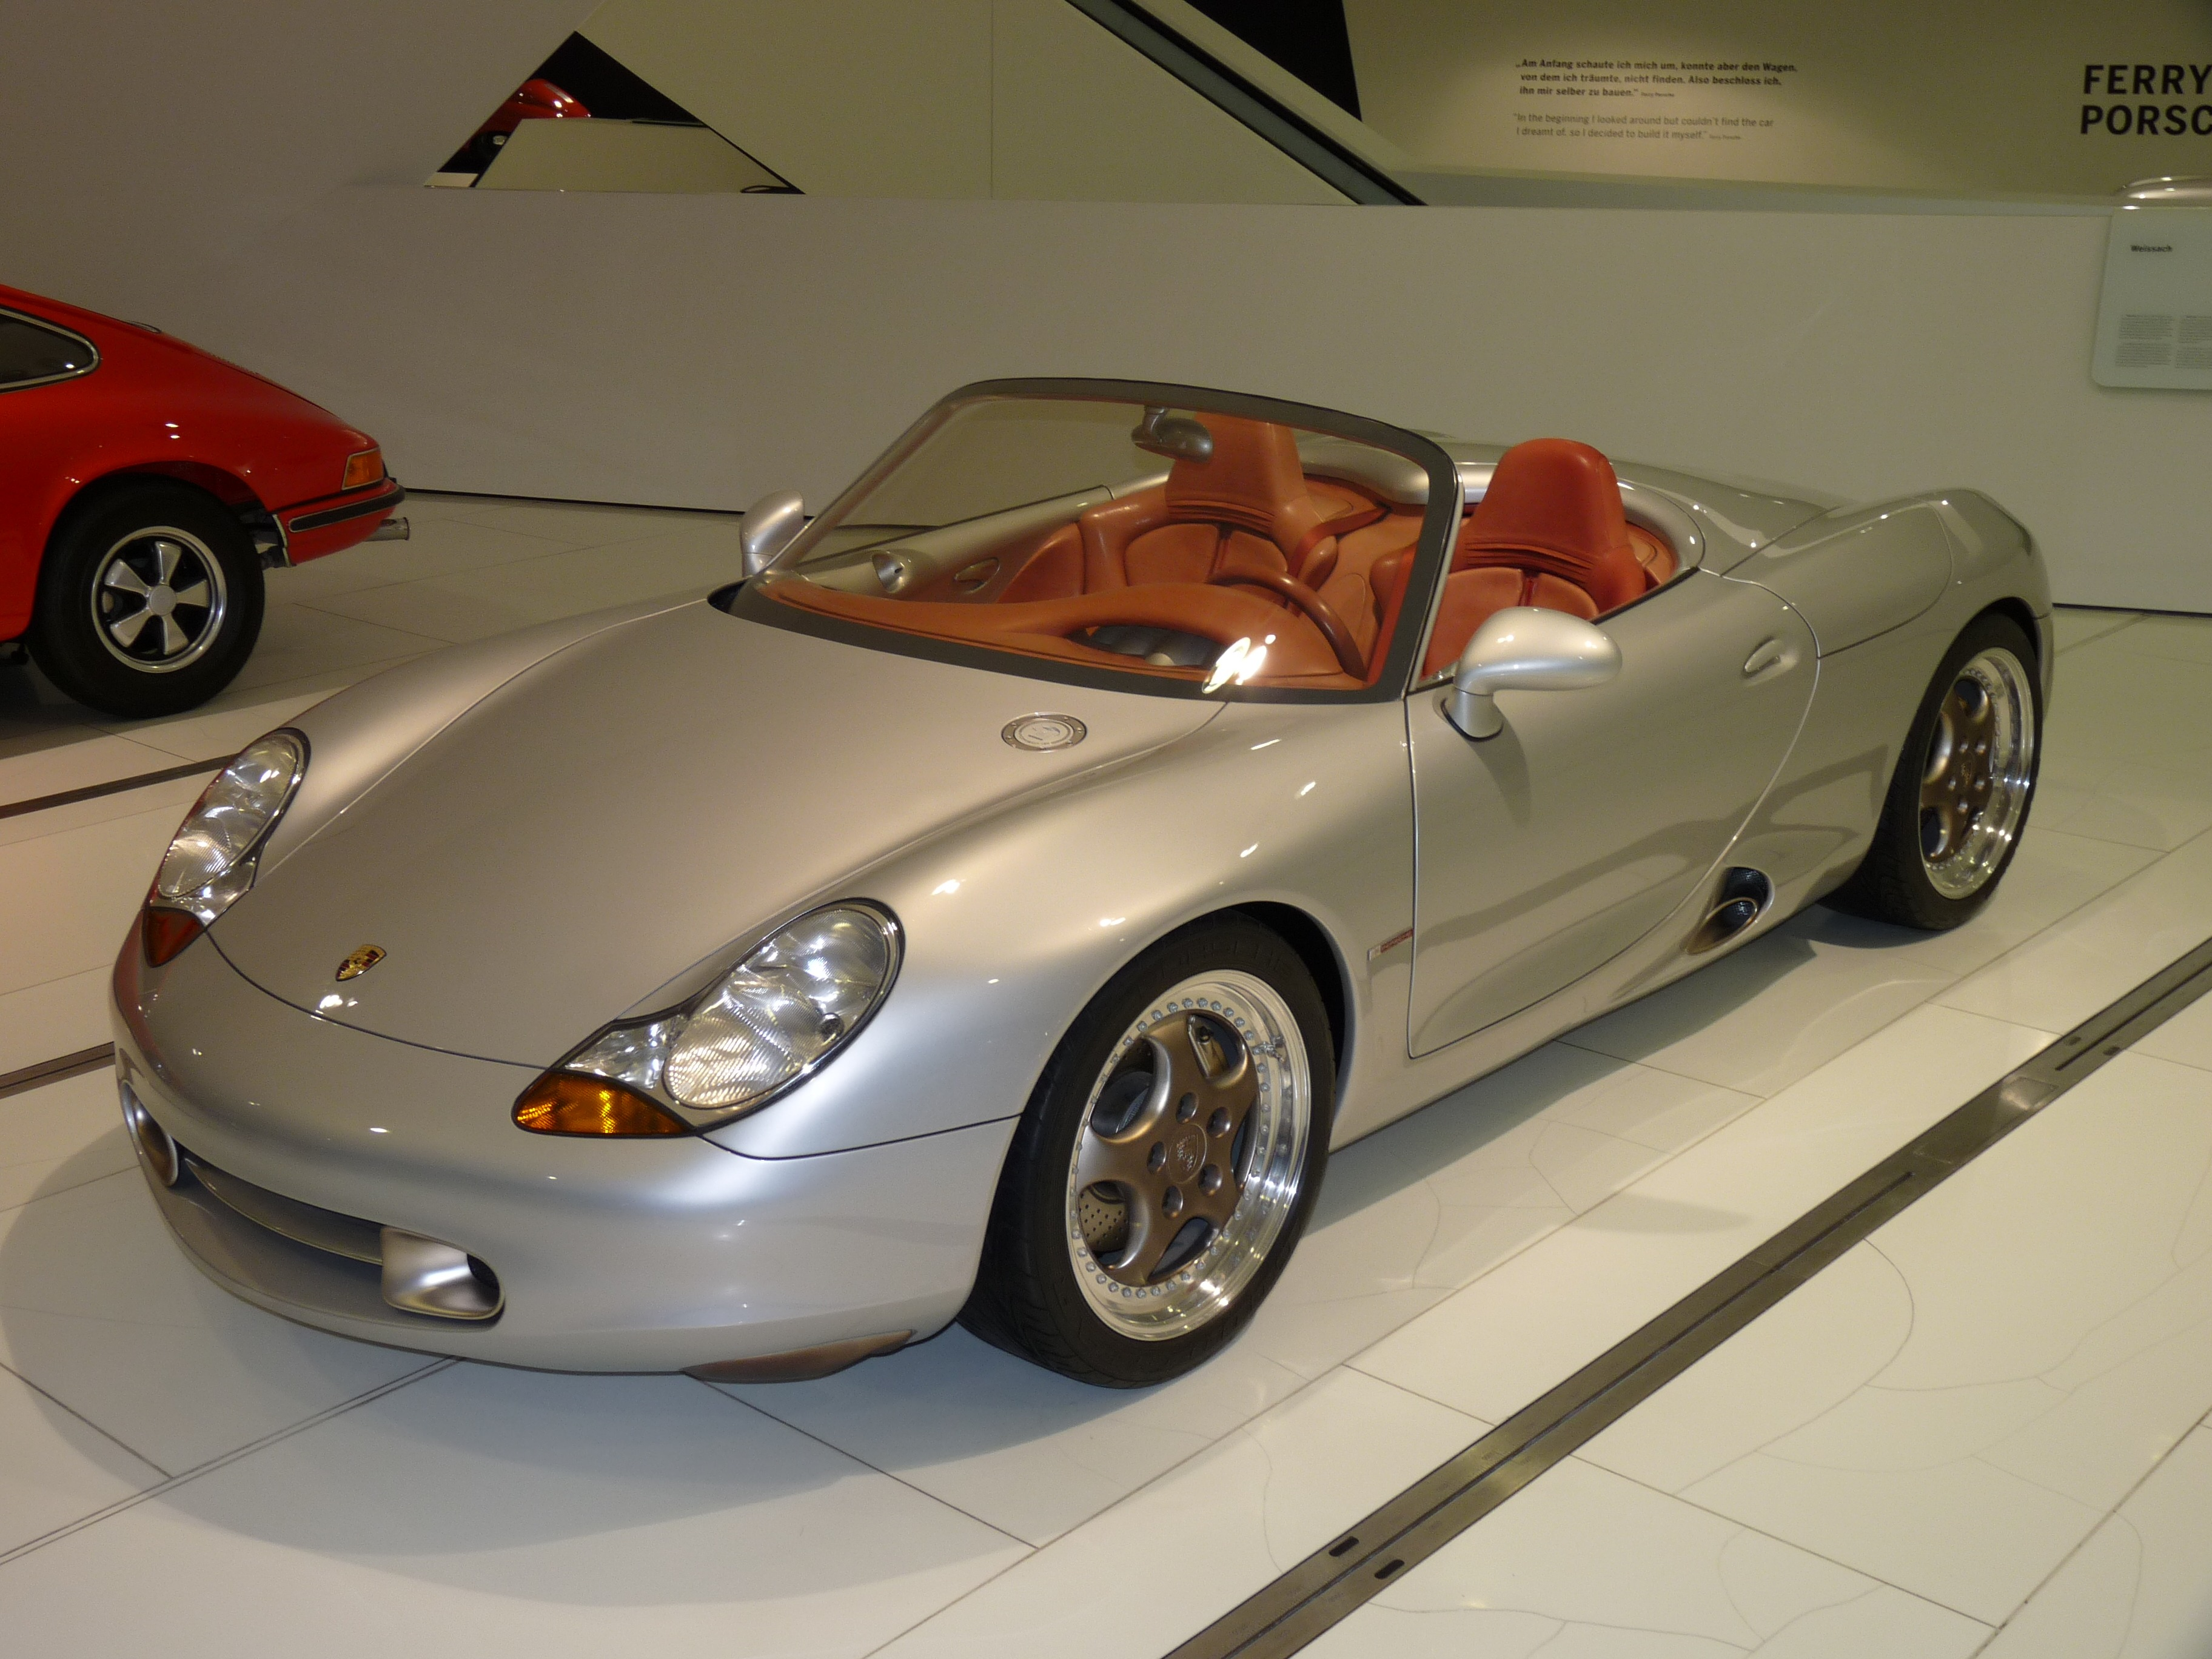 Porsche_boxster_concept_1 Porsche_boxster_concept_2 IMG_1184  Porsche_boxster_concept_4 Porsche_boxster_concept_5  Porsche_boxster_concept_6 ...